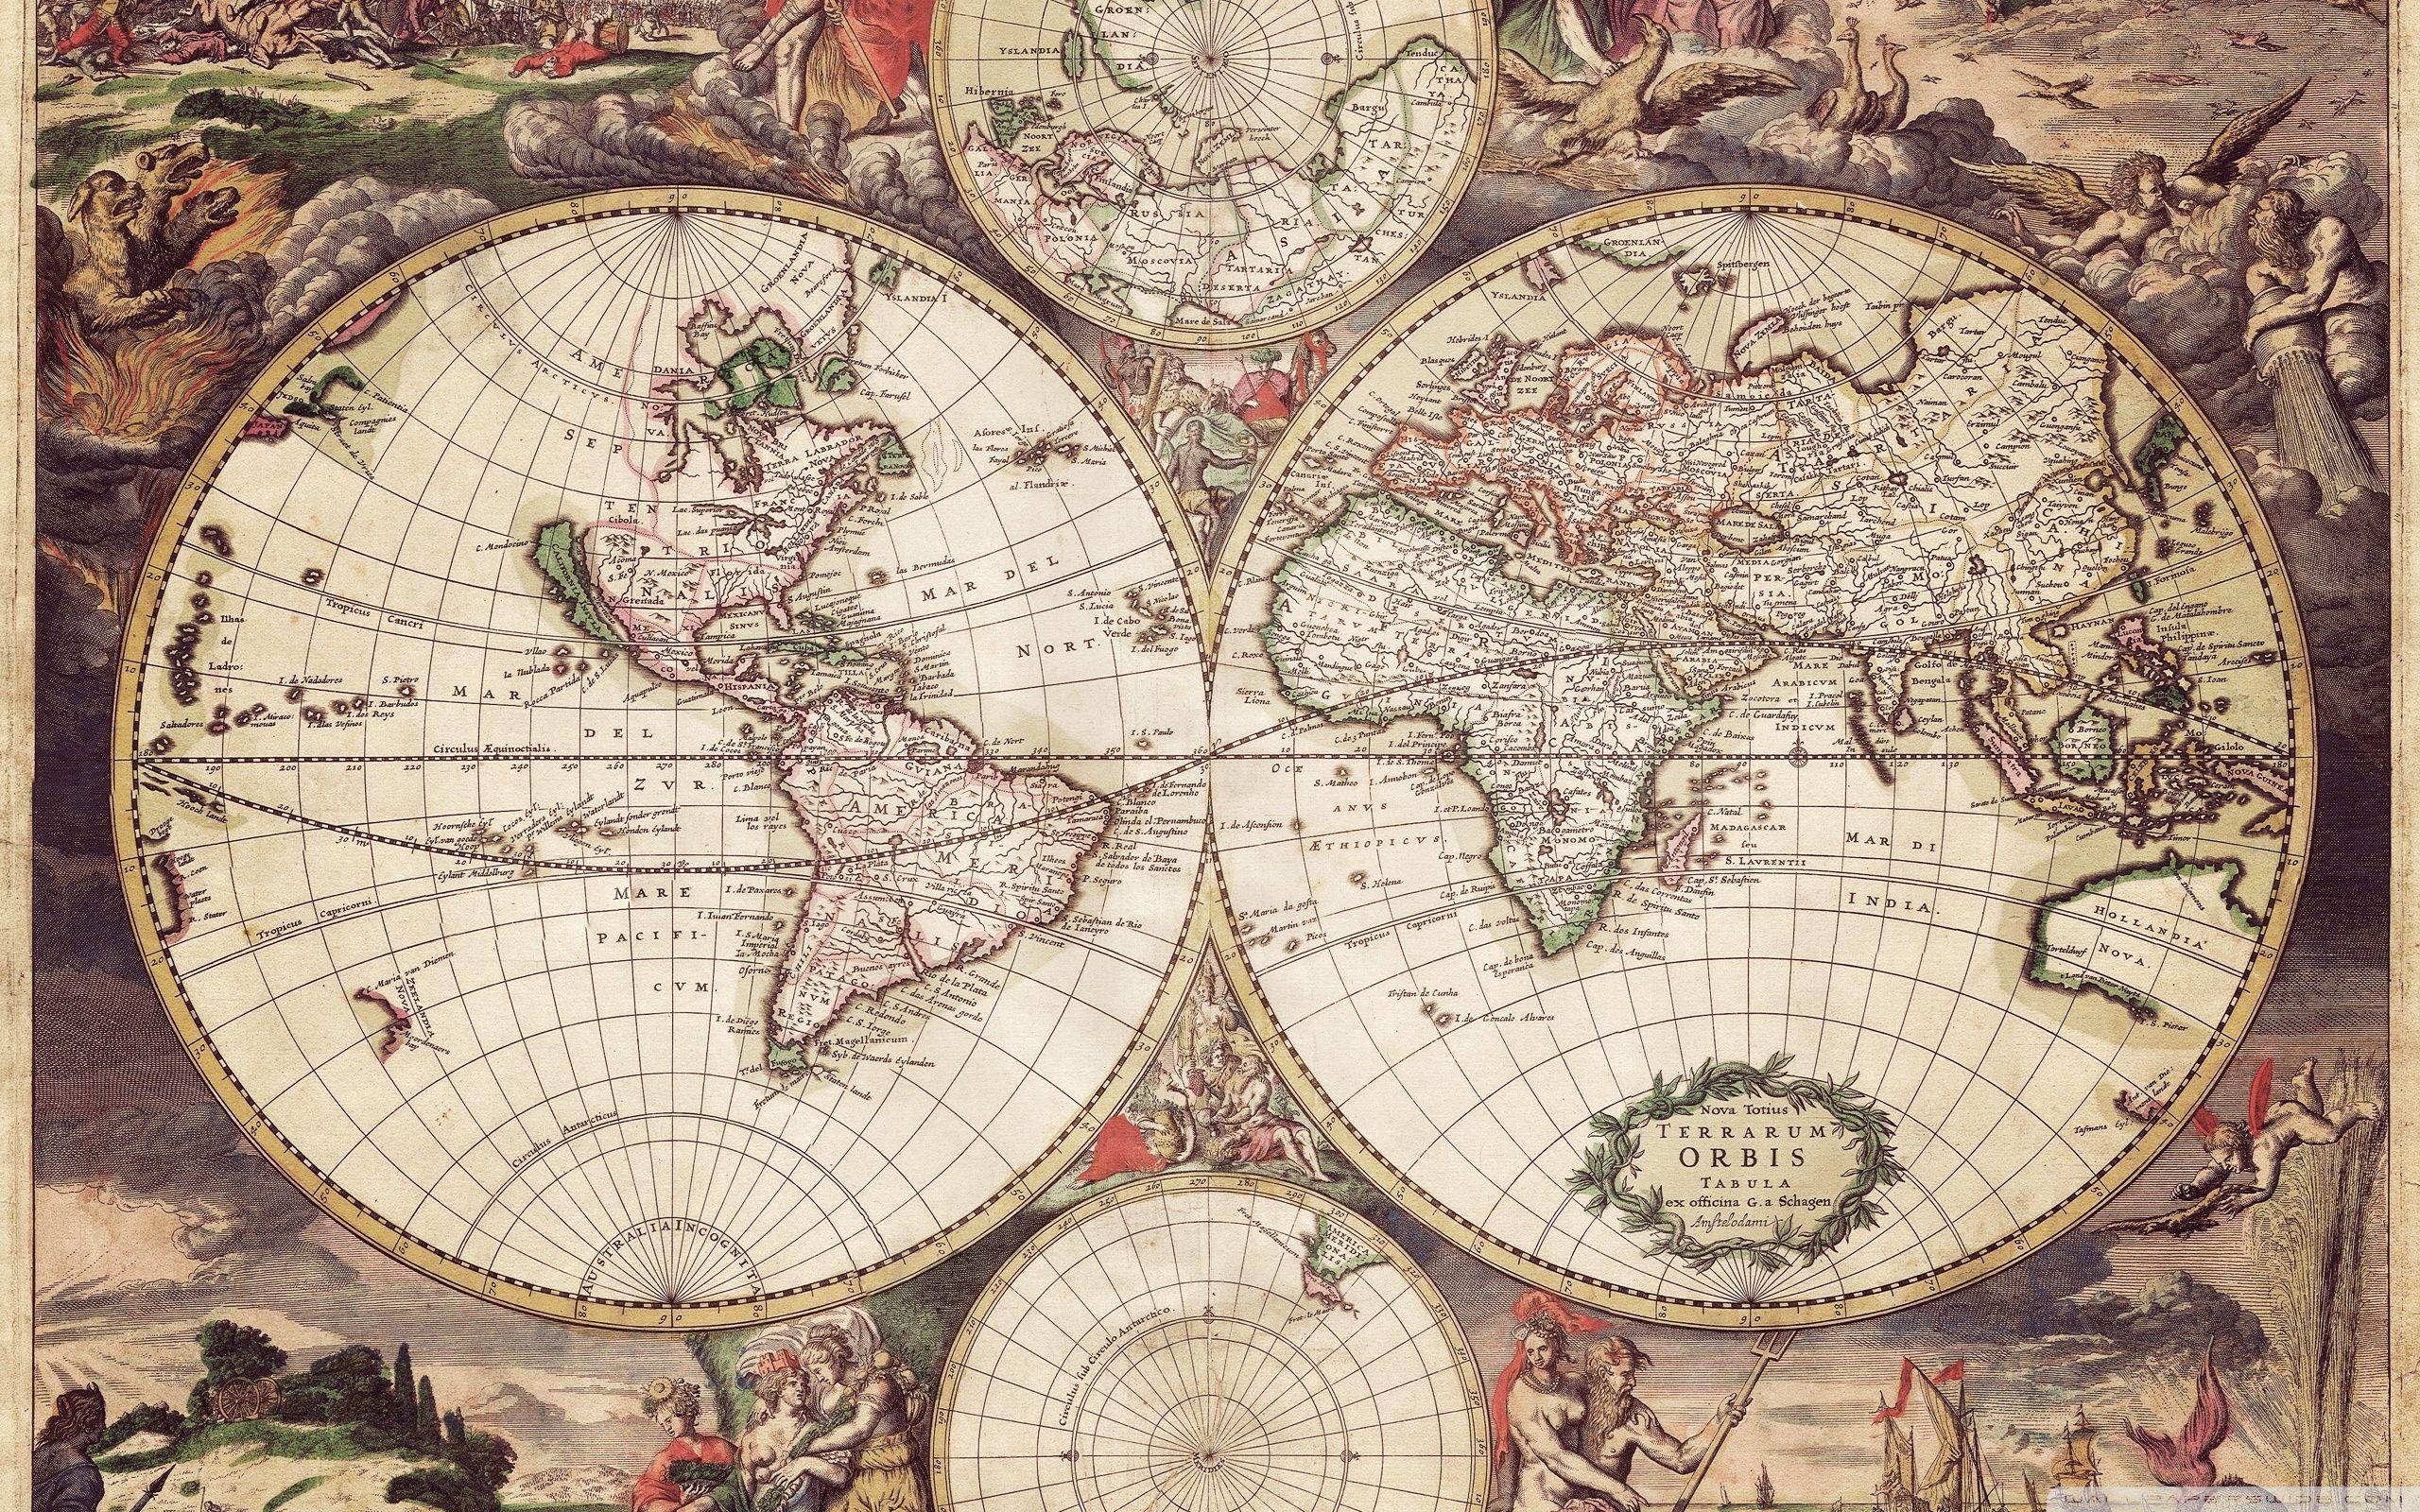 1689 World Map Gerard van Schagen Vintage Style Antique Wall Art Poster Print